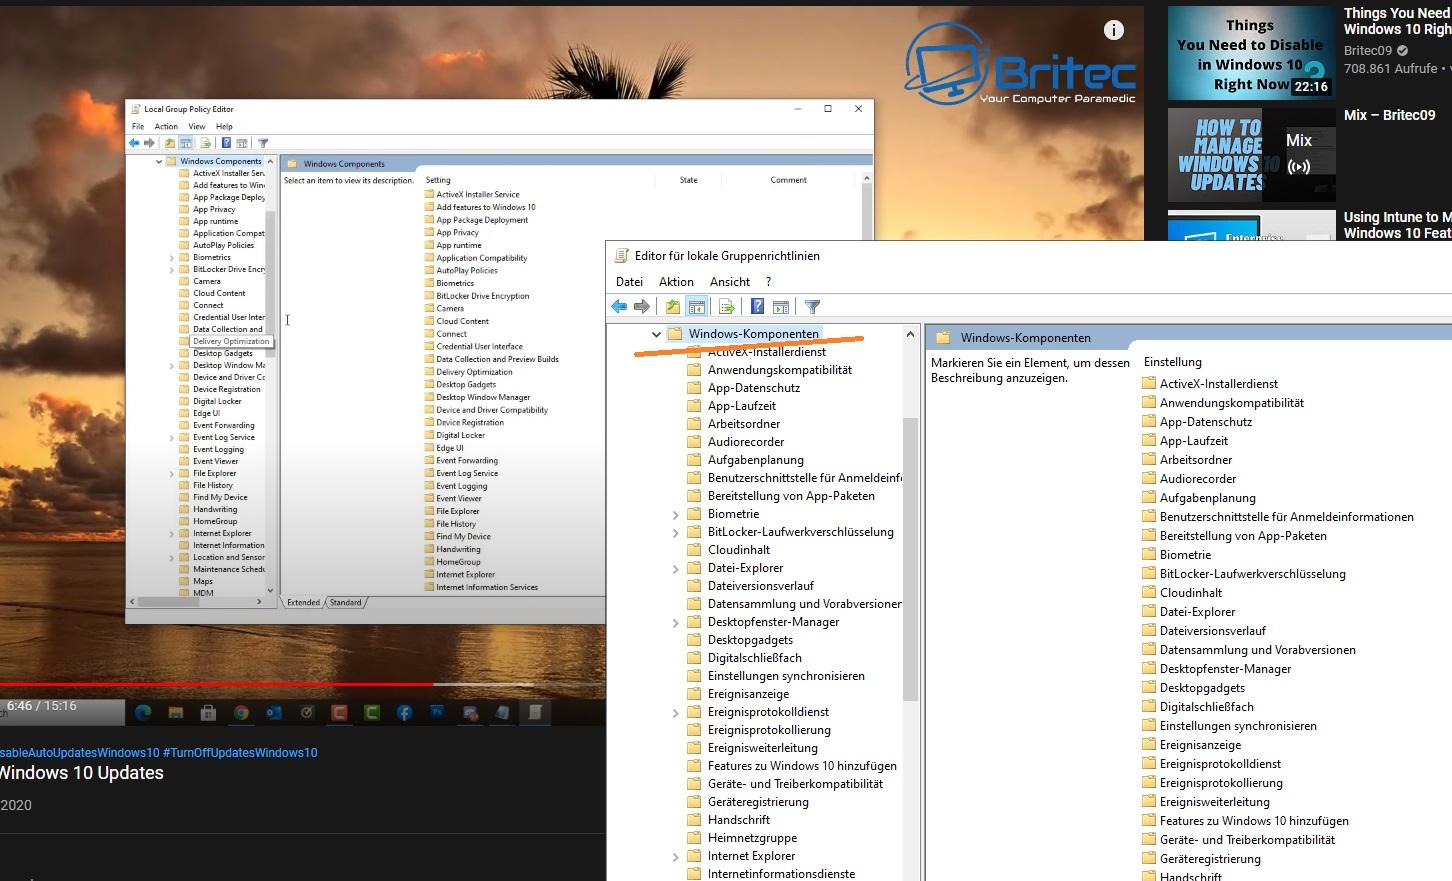 Win 10 Update managen 3.jpg